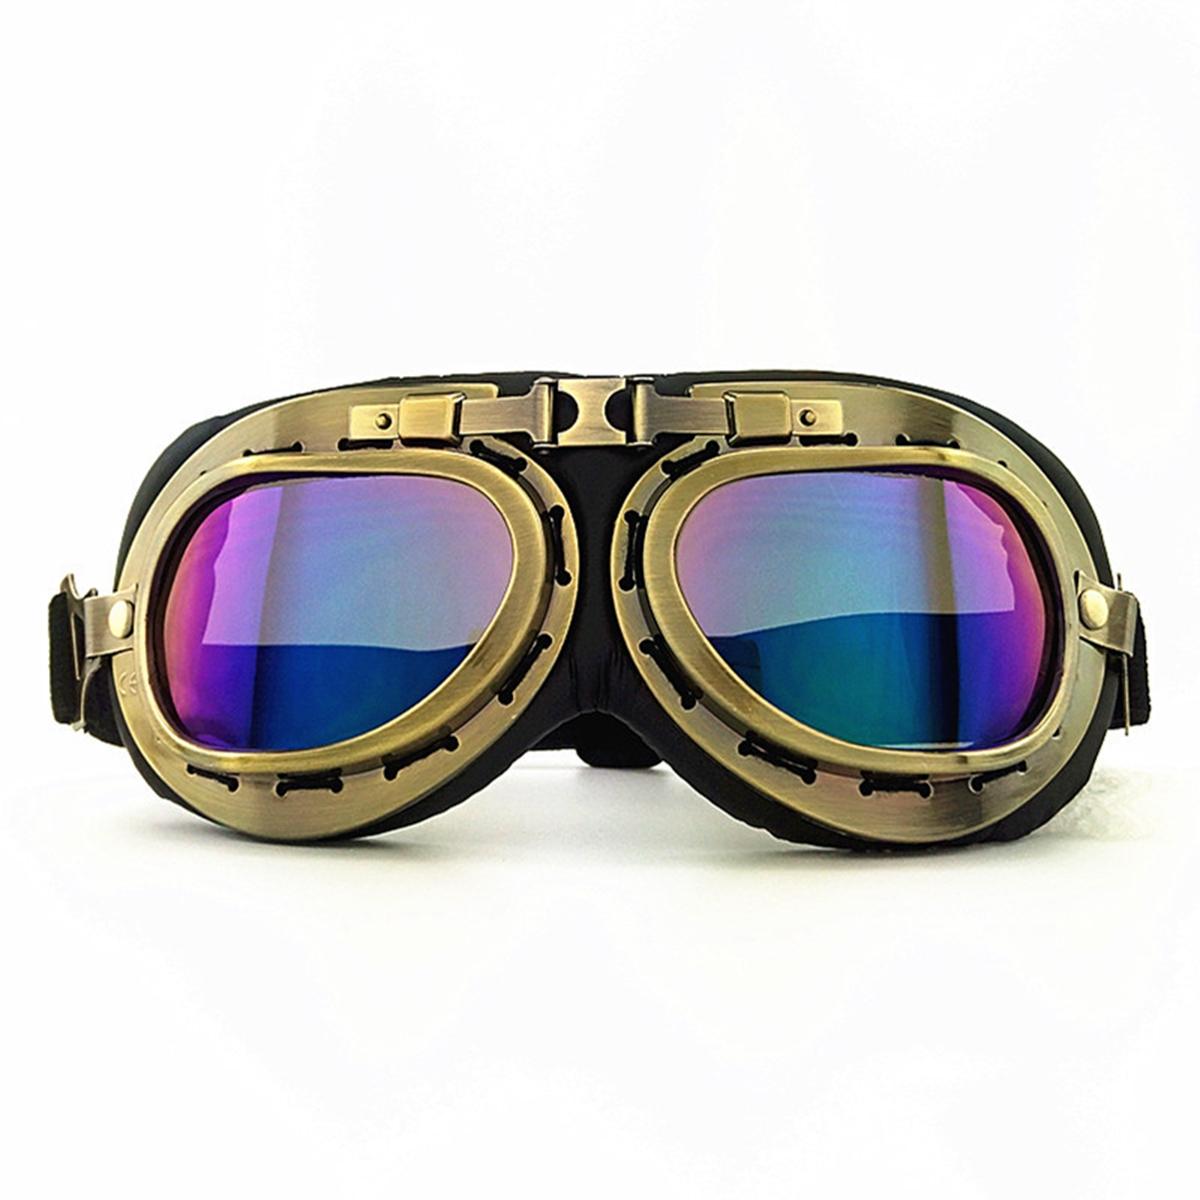 Retro Vintage Motorcycle Helmet Eyewear Goggles Riding Glasses For Harley